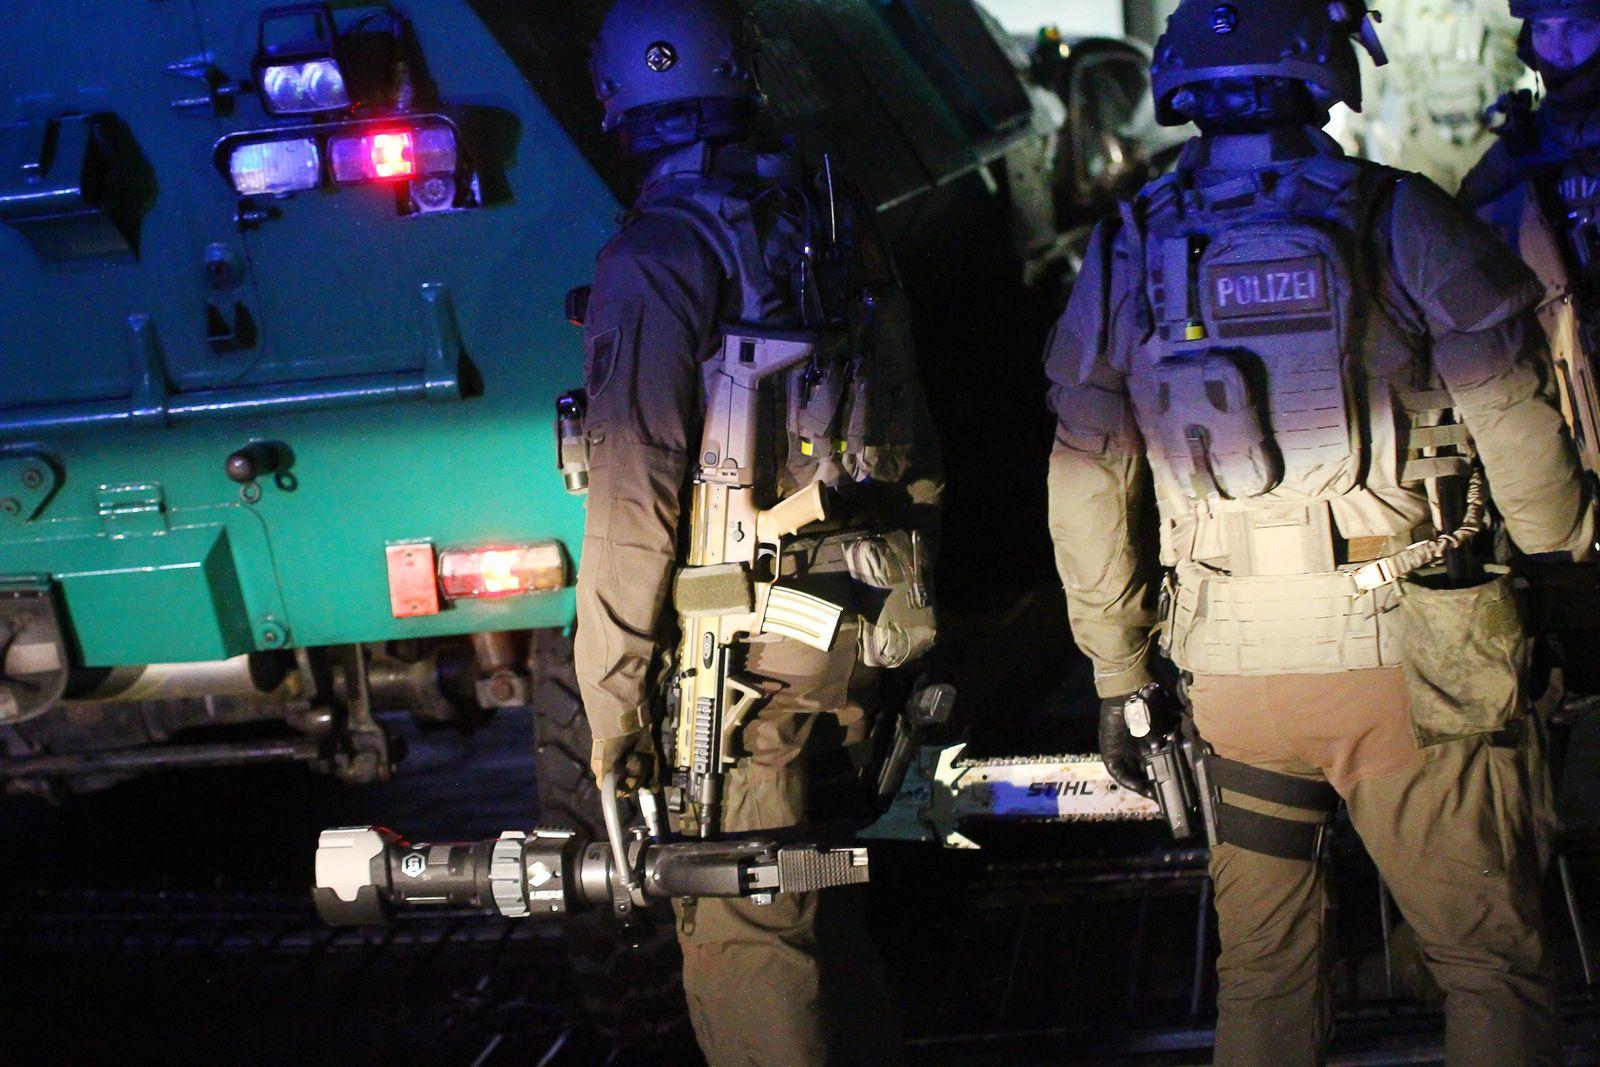 Sechs Festnahmen in Rockerszene - SEK-Einsätze